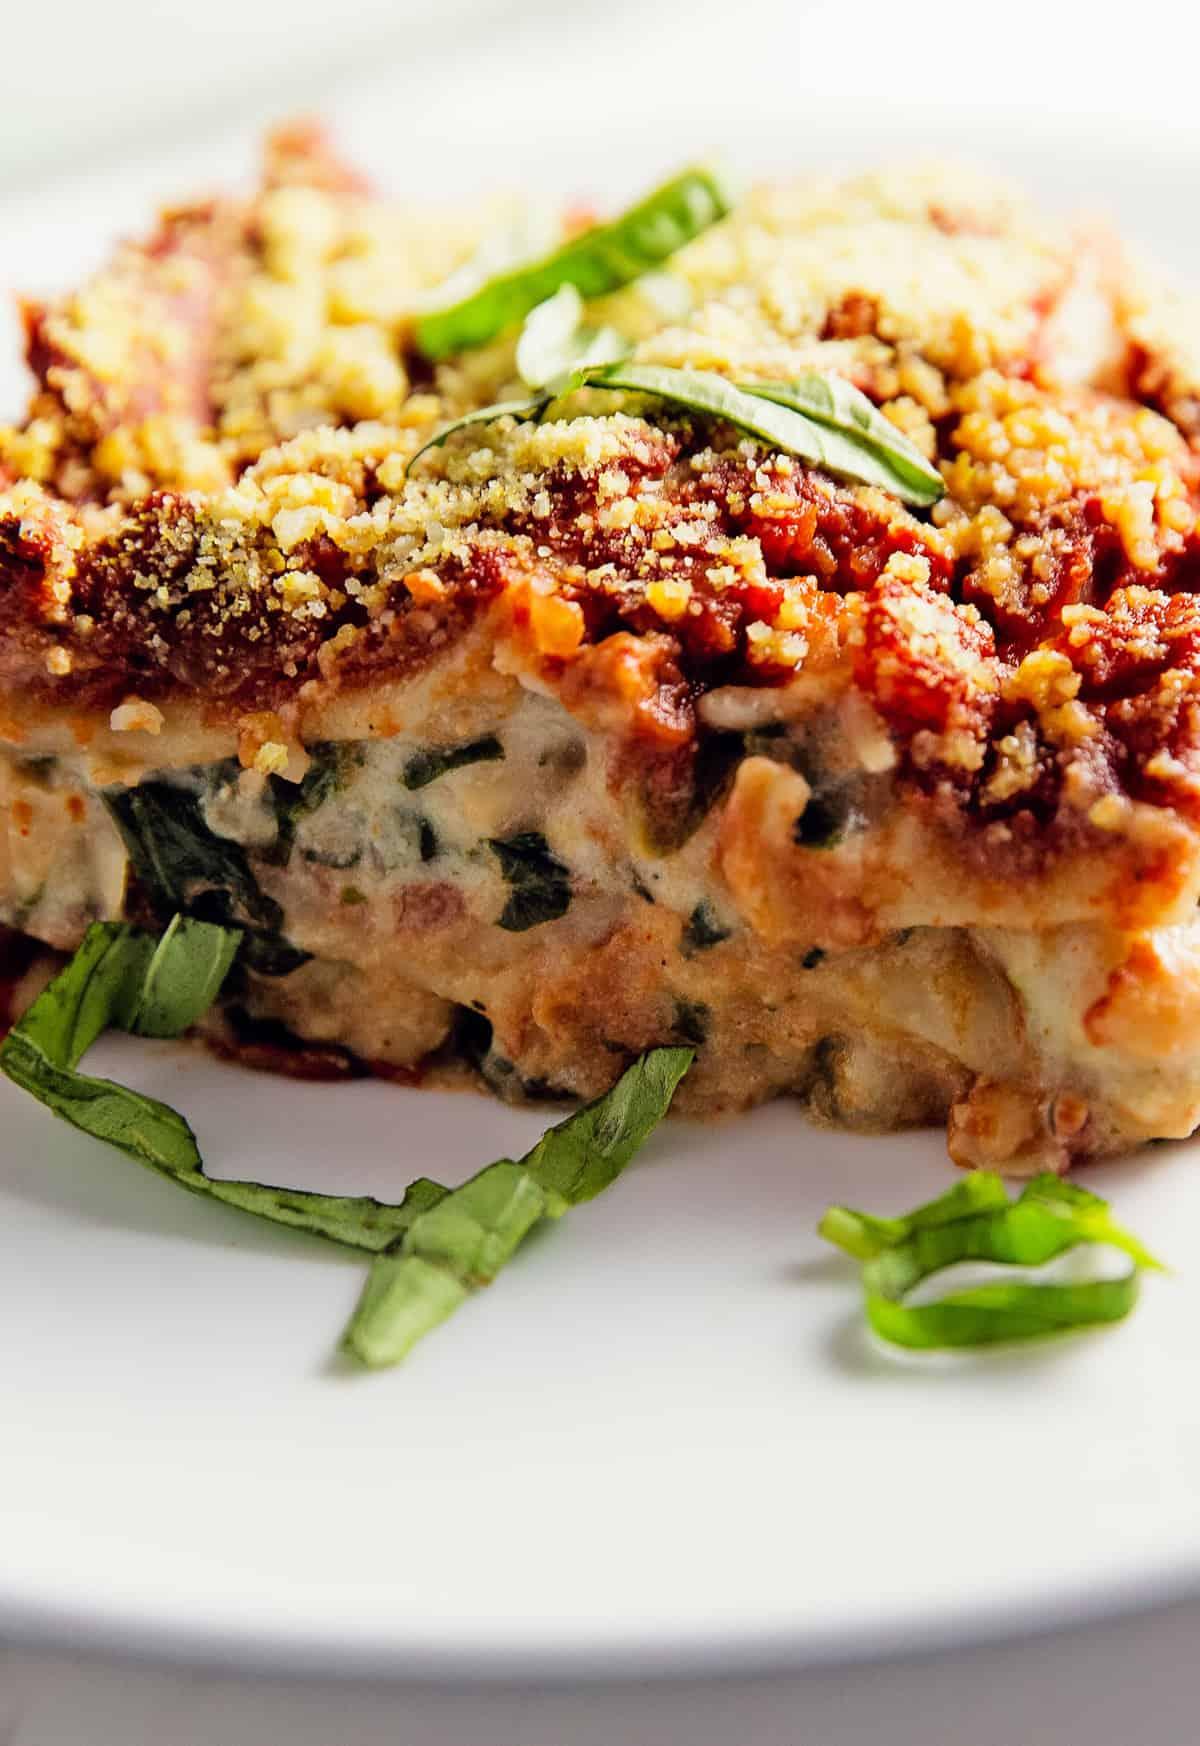 Lasagna monkey and me kitchen adventures lasagna bchamel and red sauce marinara recipe vegan vegetarian whole forumfinder Images